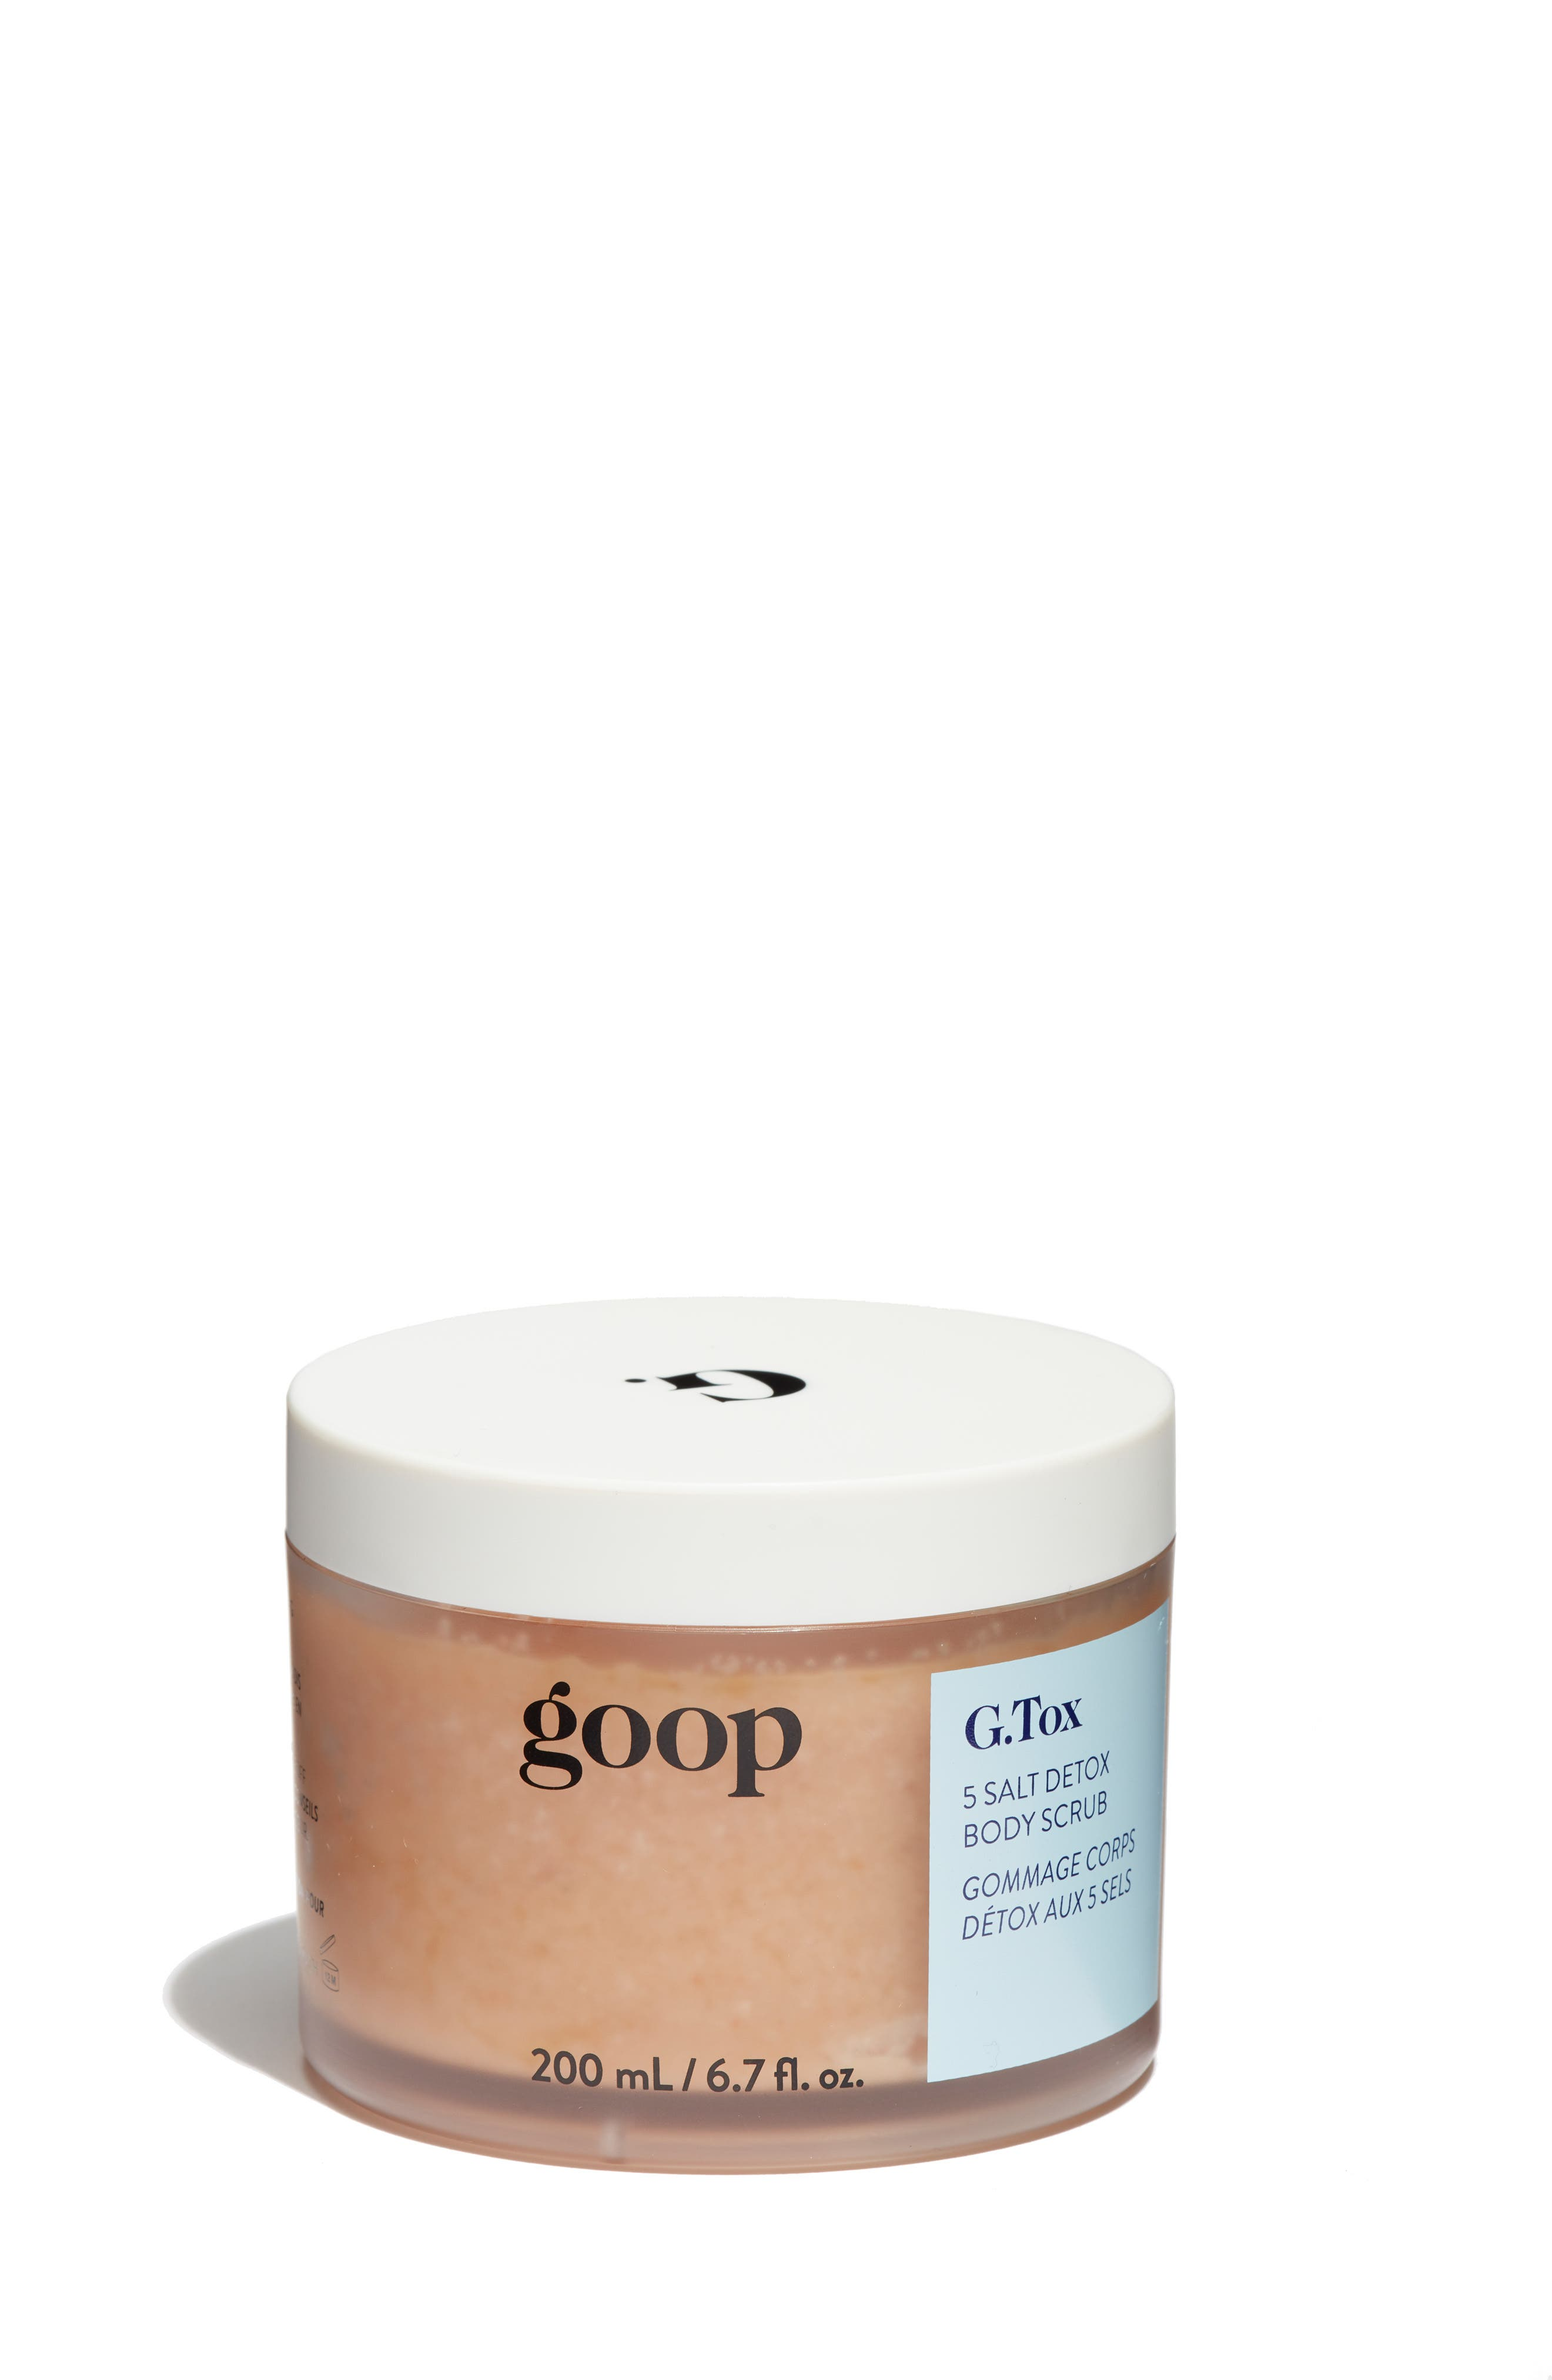 G.Tox 5 Salt Detox Body Scrub, Main, color, 960